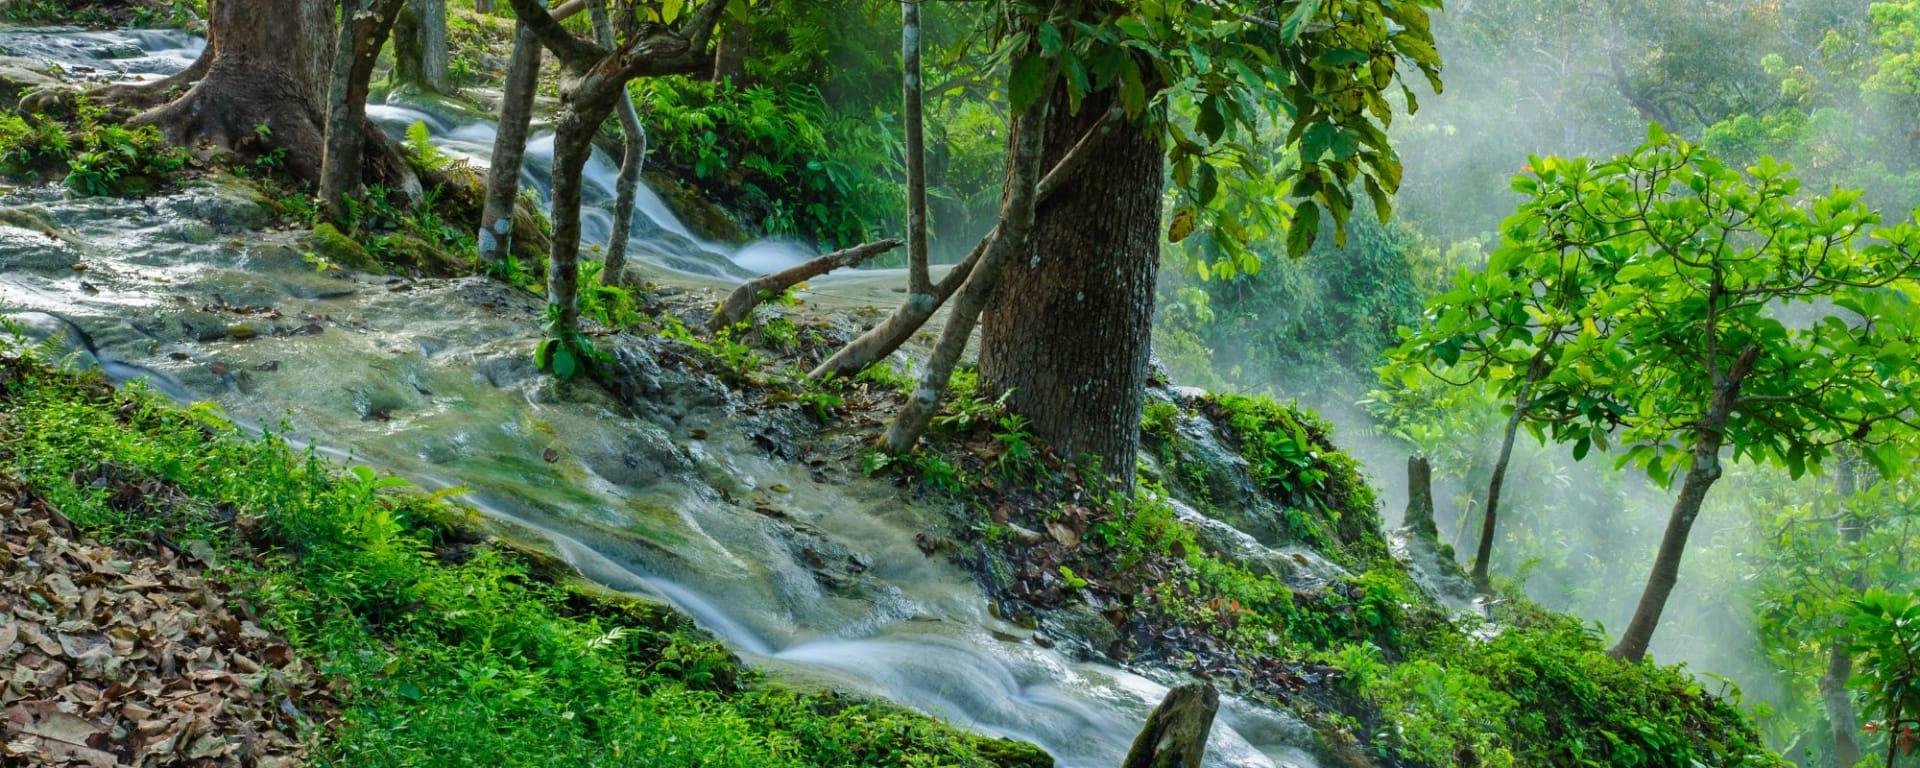 Nature & éléphants dans le nord de la Thaïlande de Chiang Mai: Northern Thailand Mae Tang Valley Bua Tong Waterfall